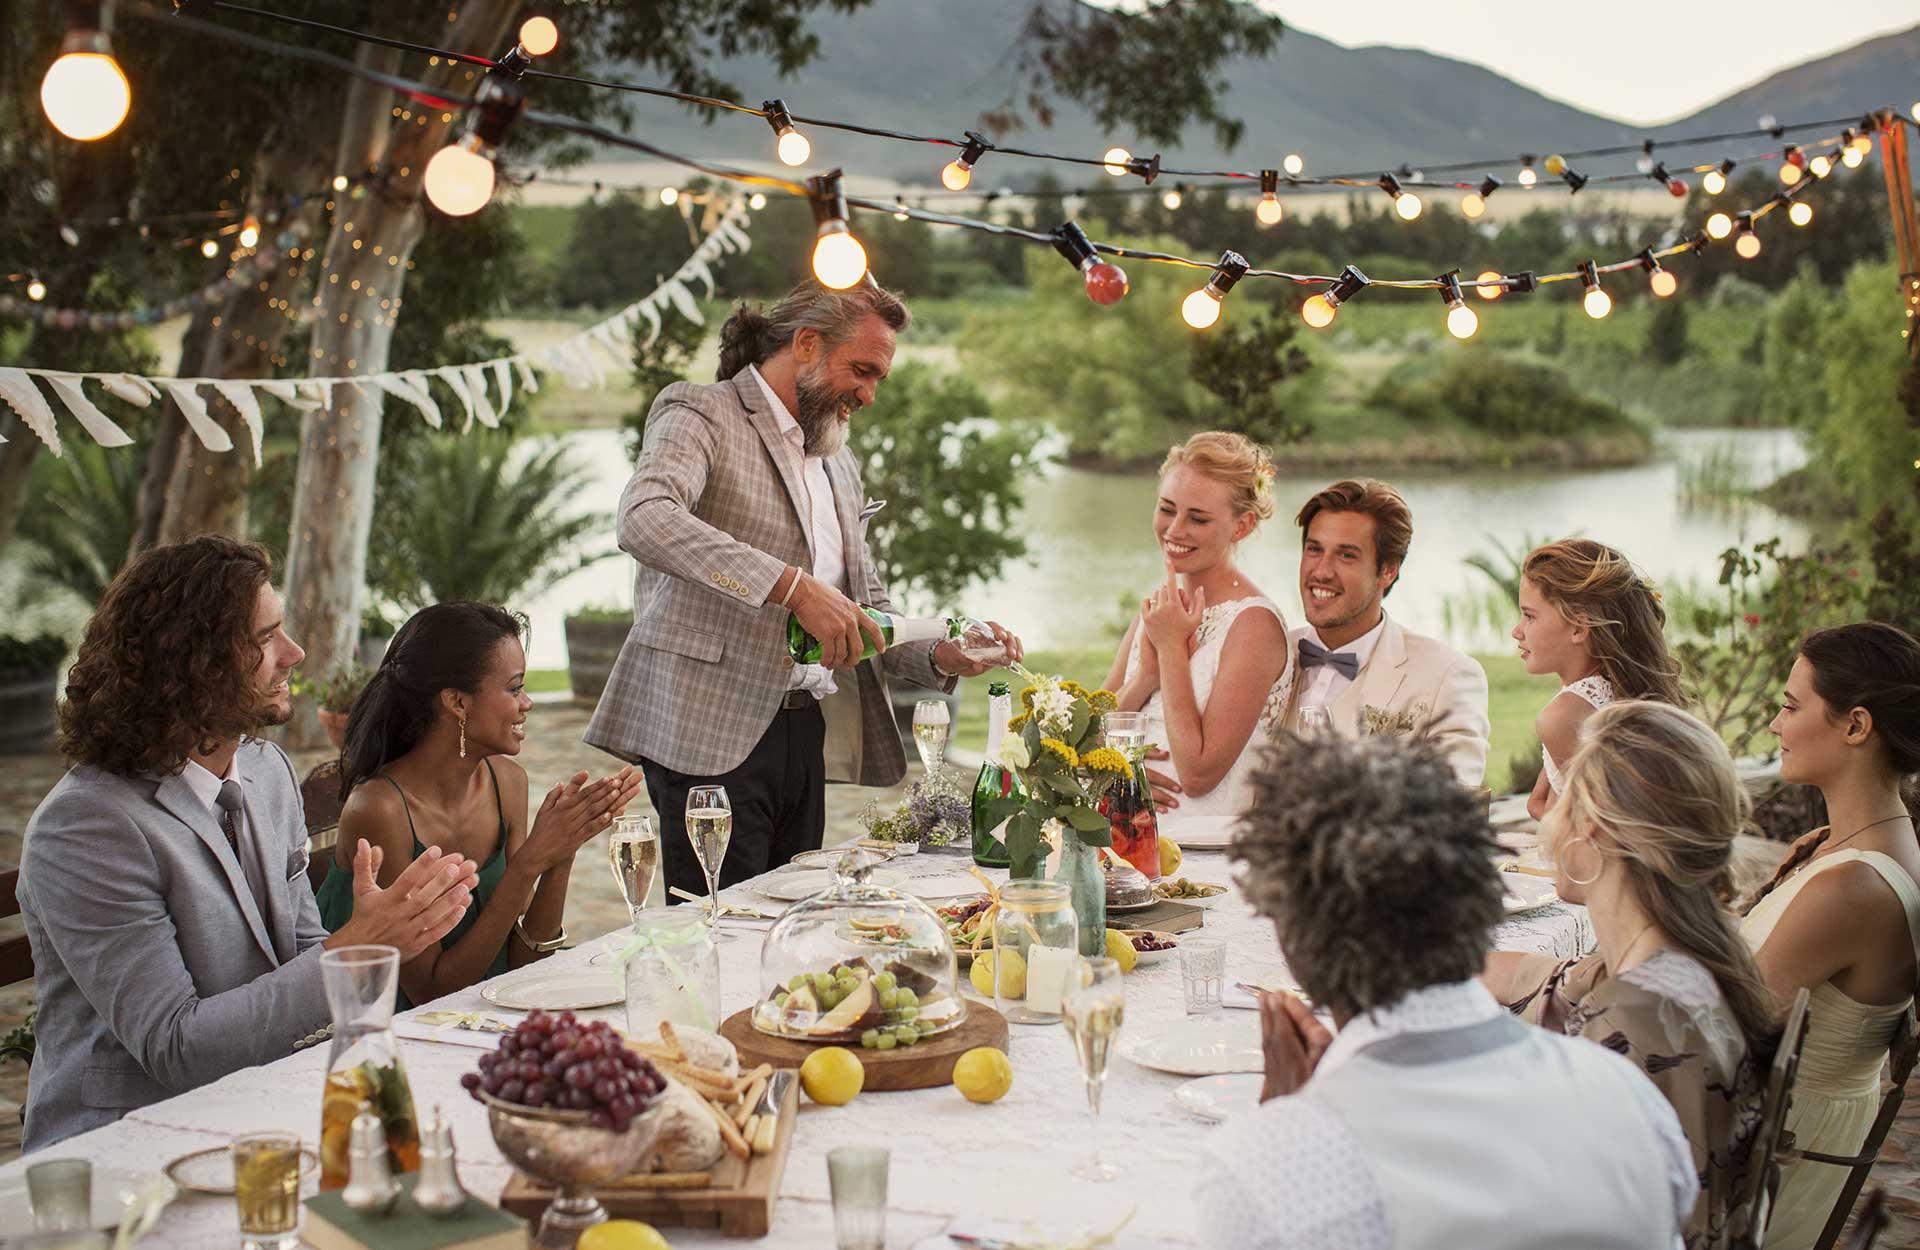 bröllopsfest utomhus